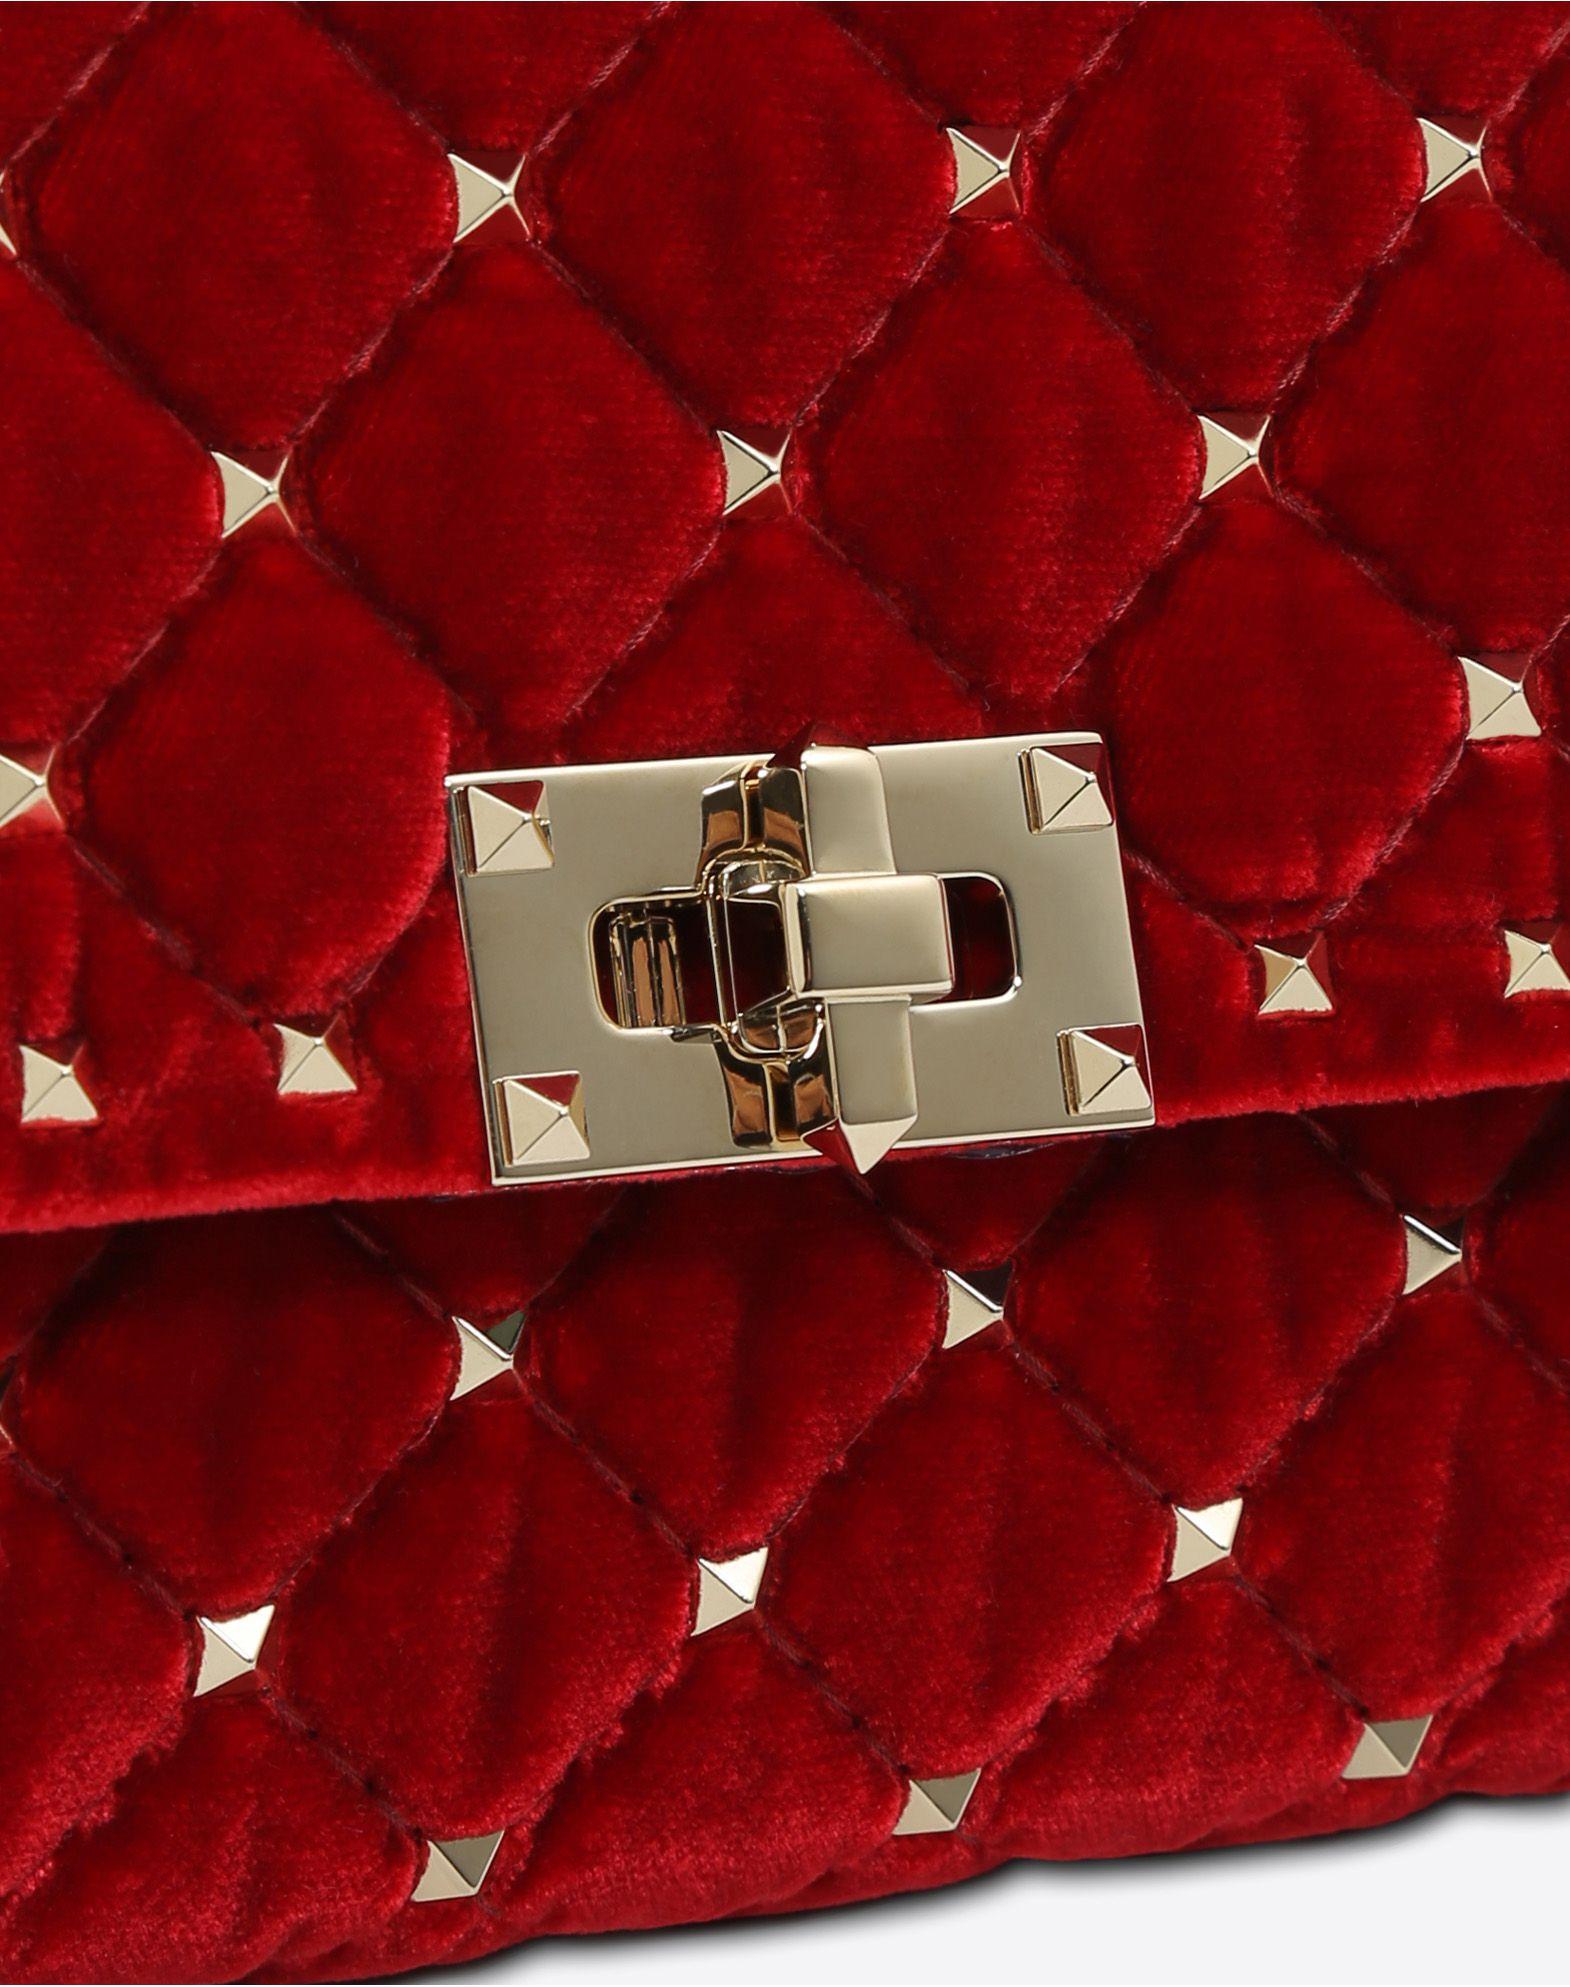 VALENTINO GARAVANI Rockstud Spike Chain Bag CROSS BODY BAG D b